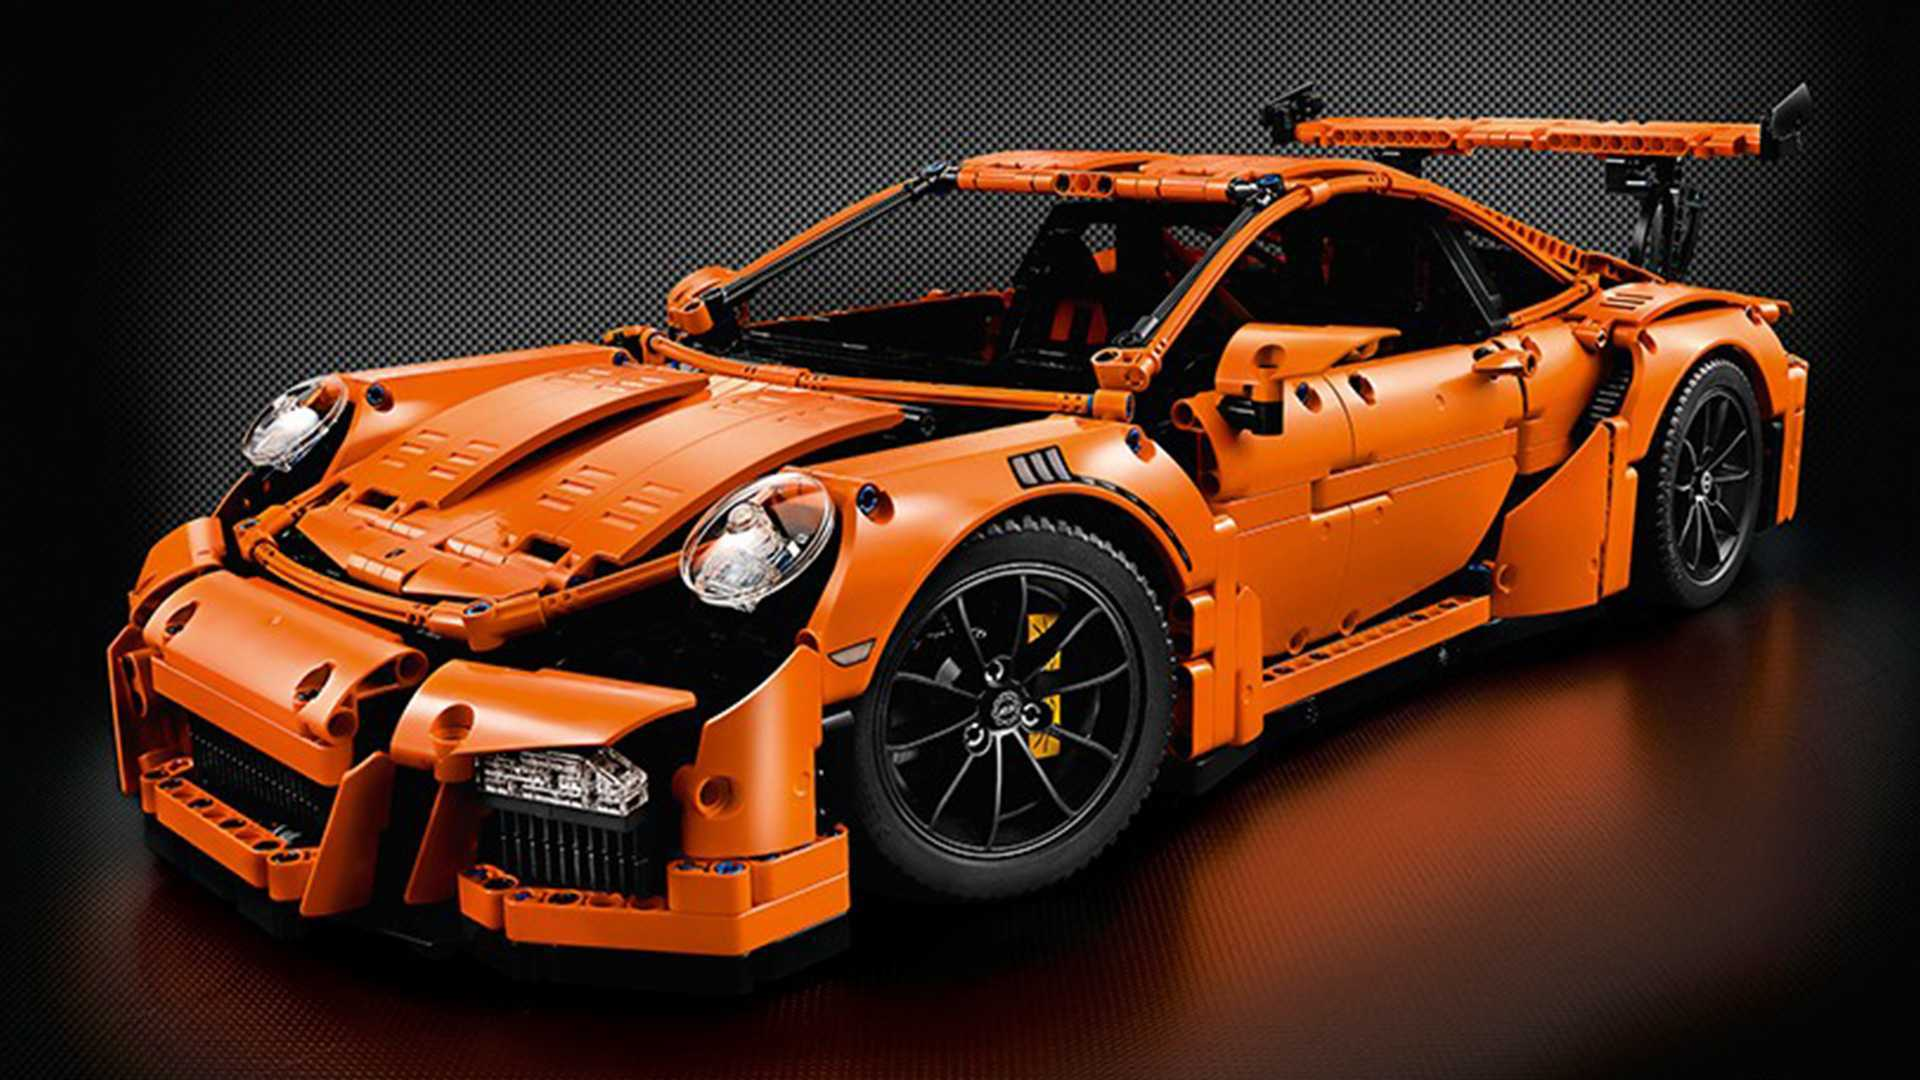 2016 Lego Technic Porsche 911 GT3 RS